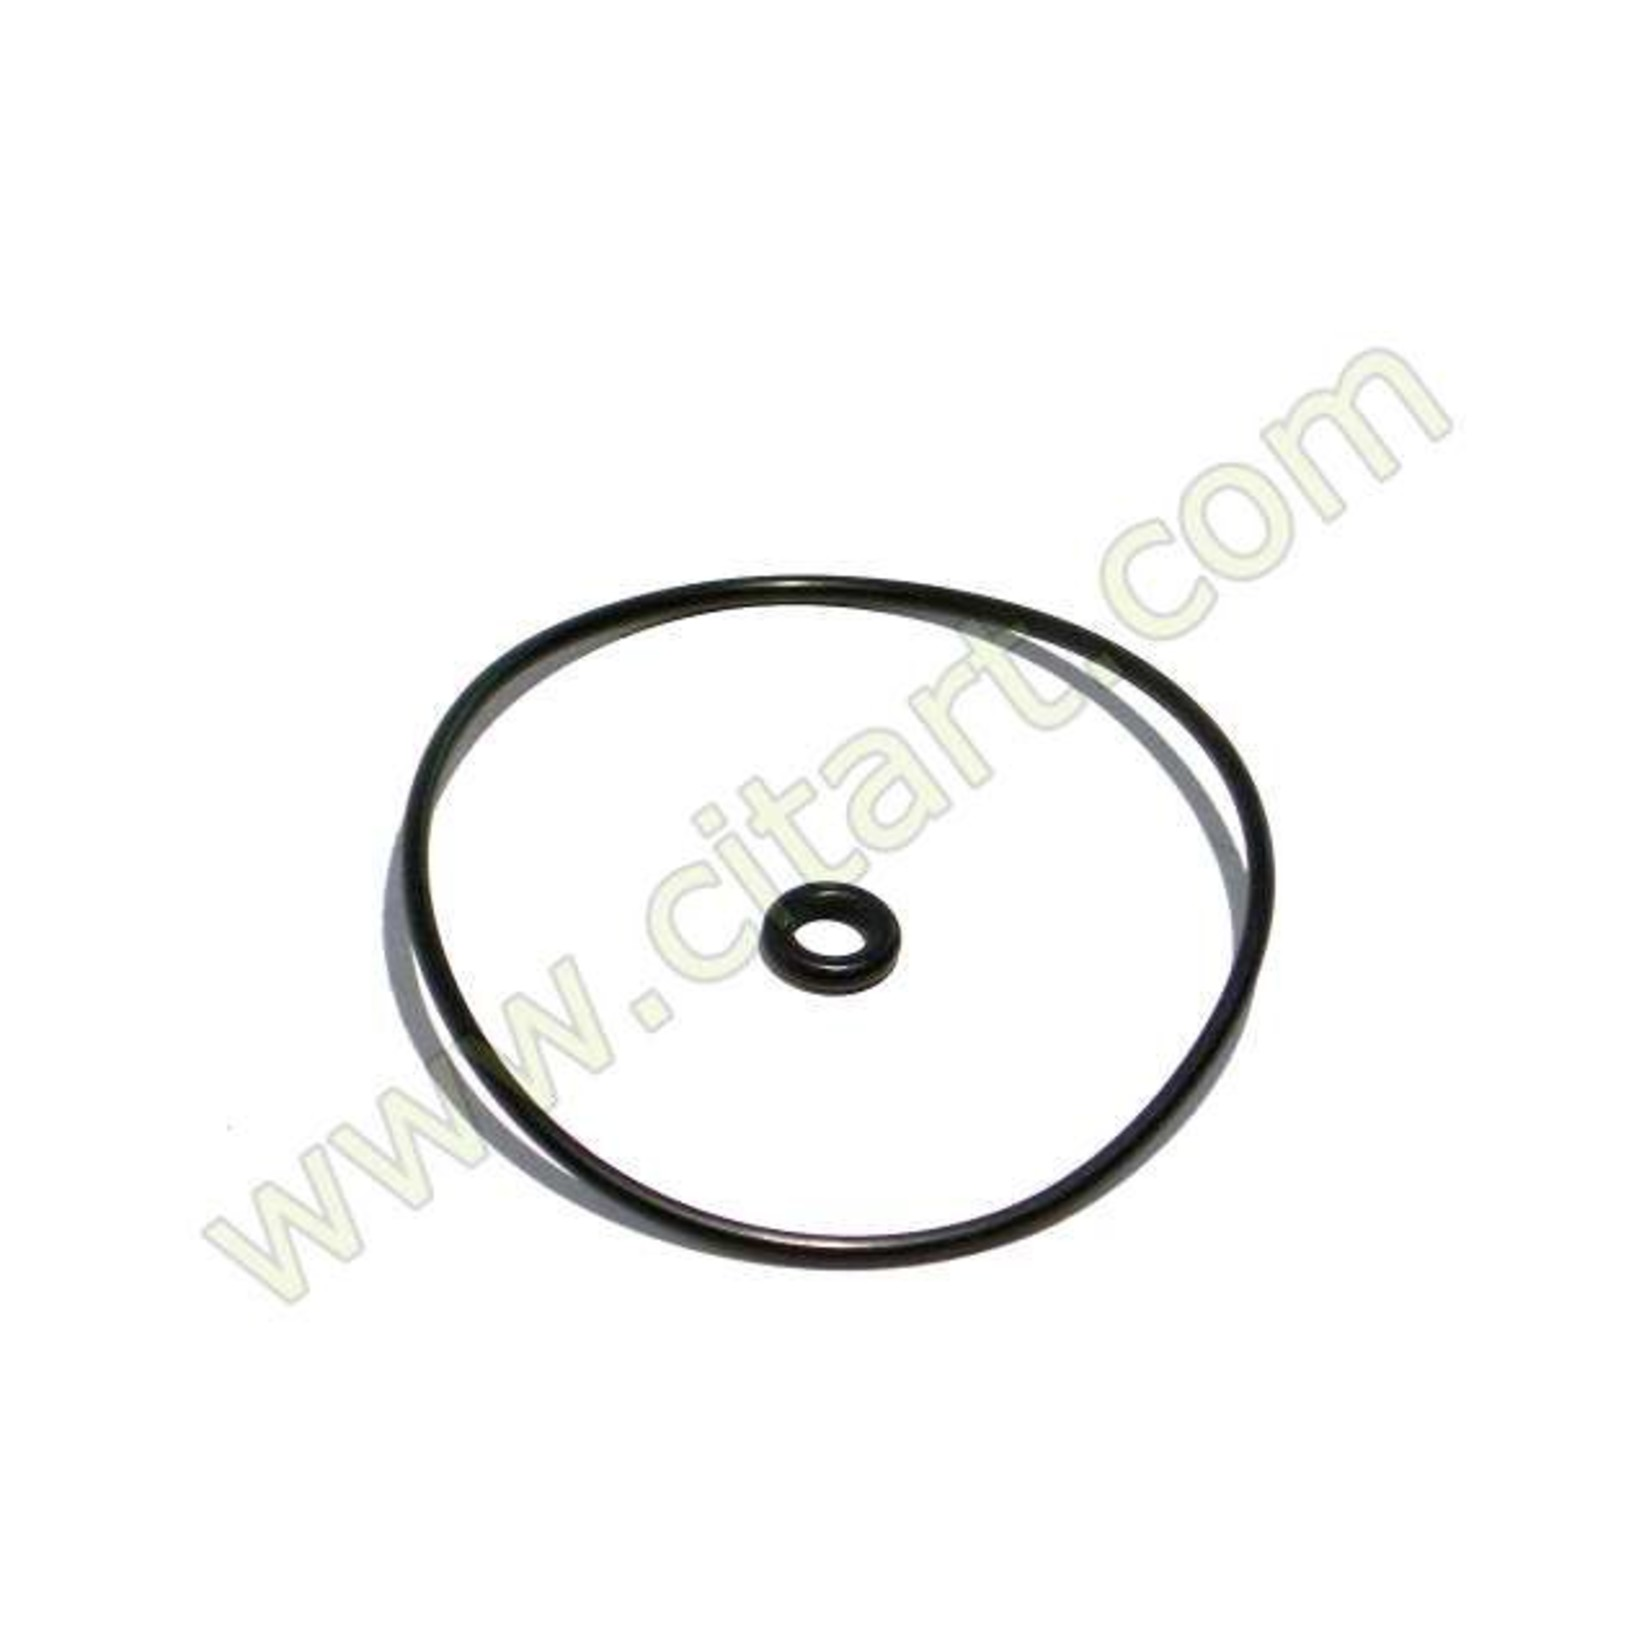 Sealing ring oil filter big Nr Org: 24888009